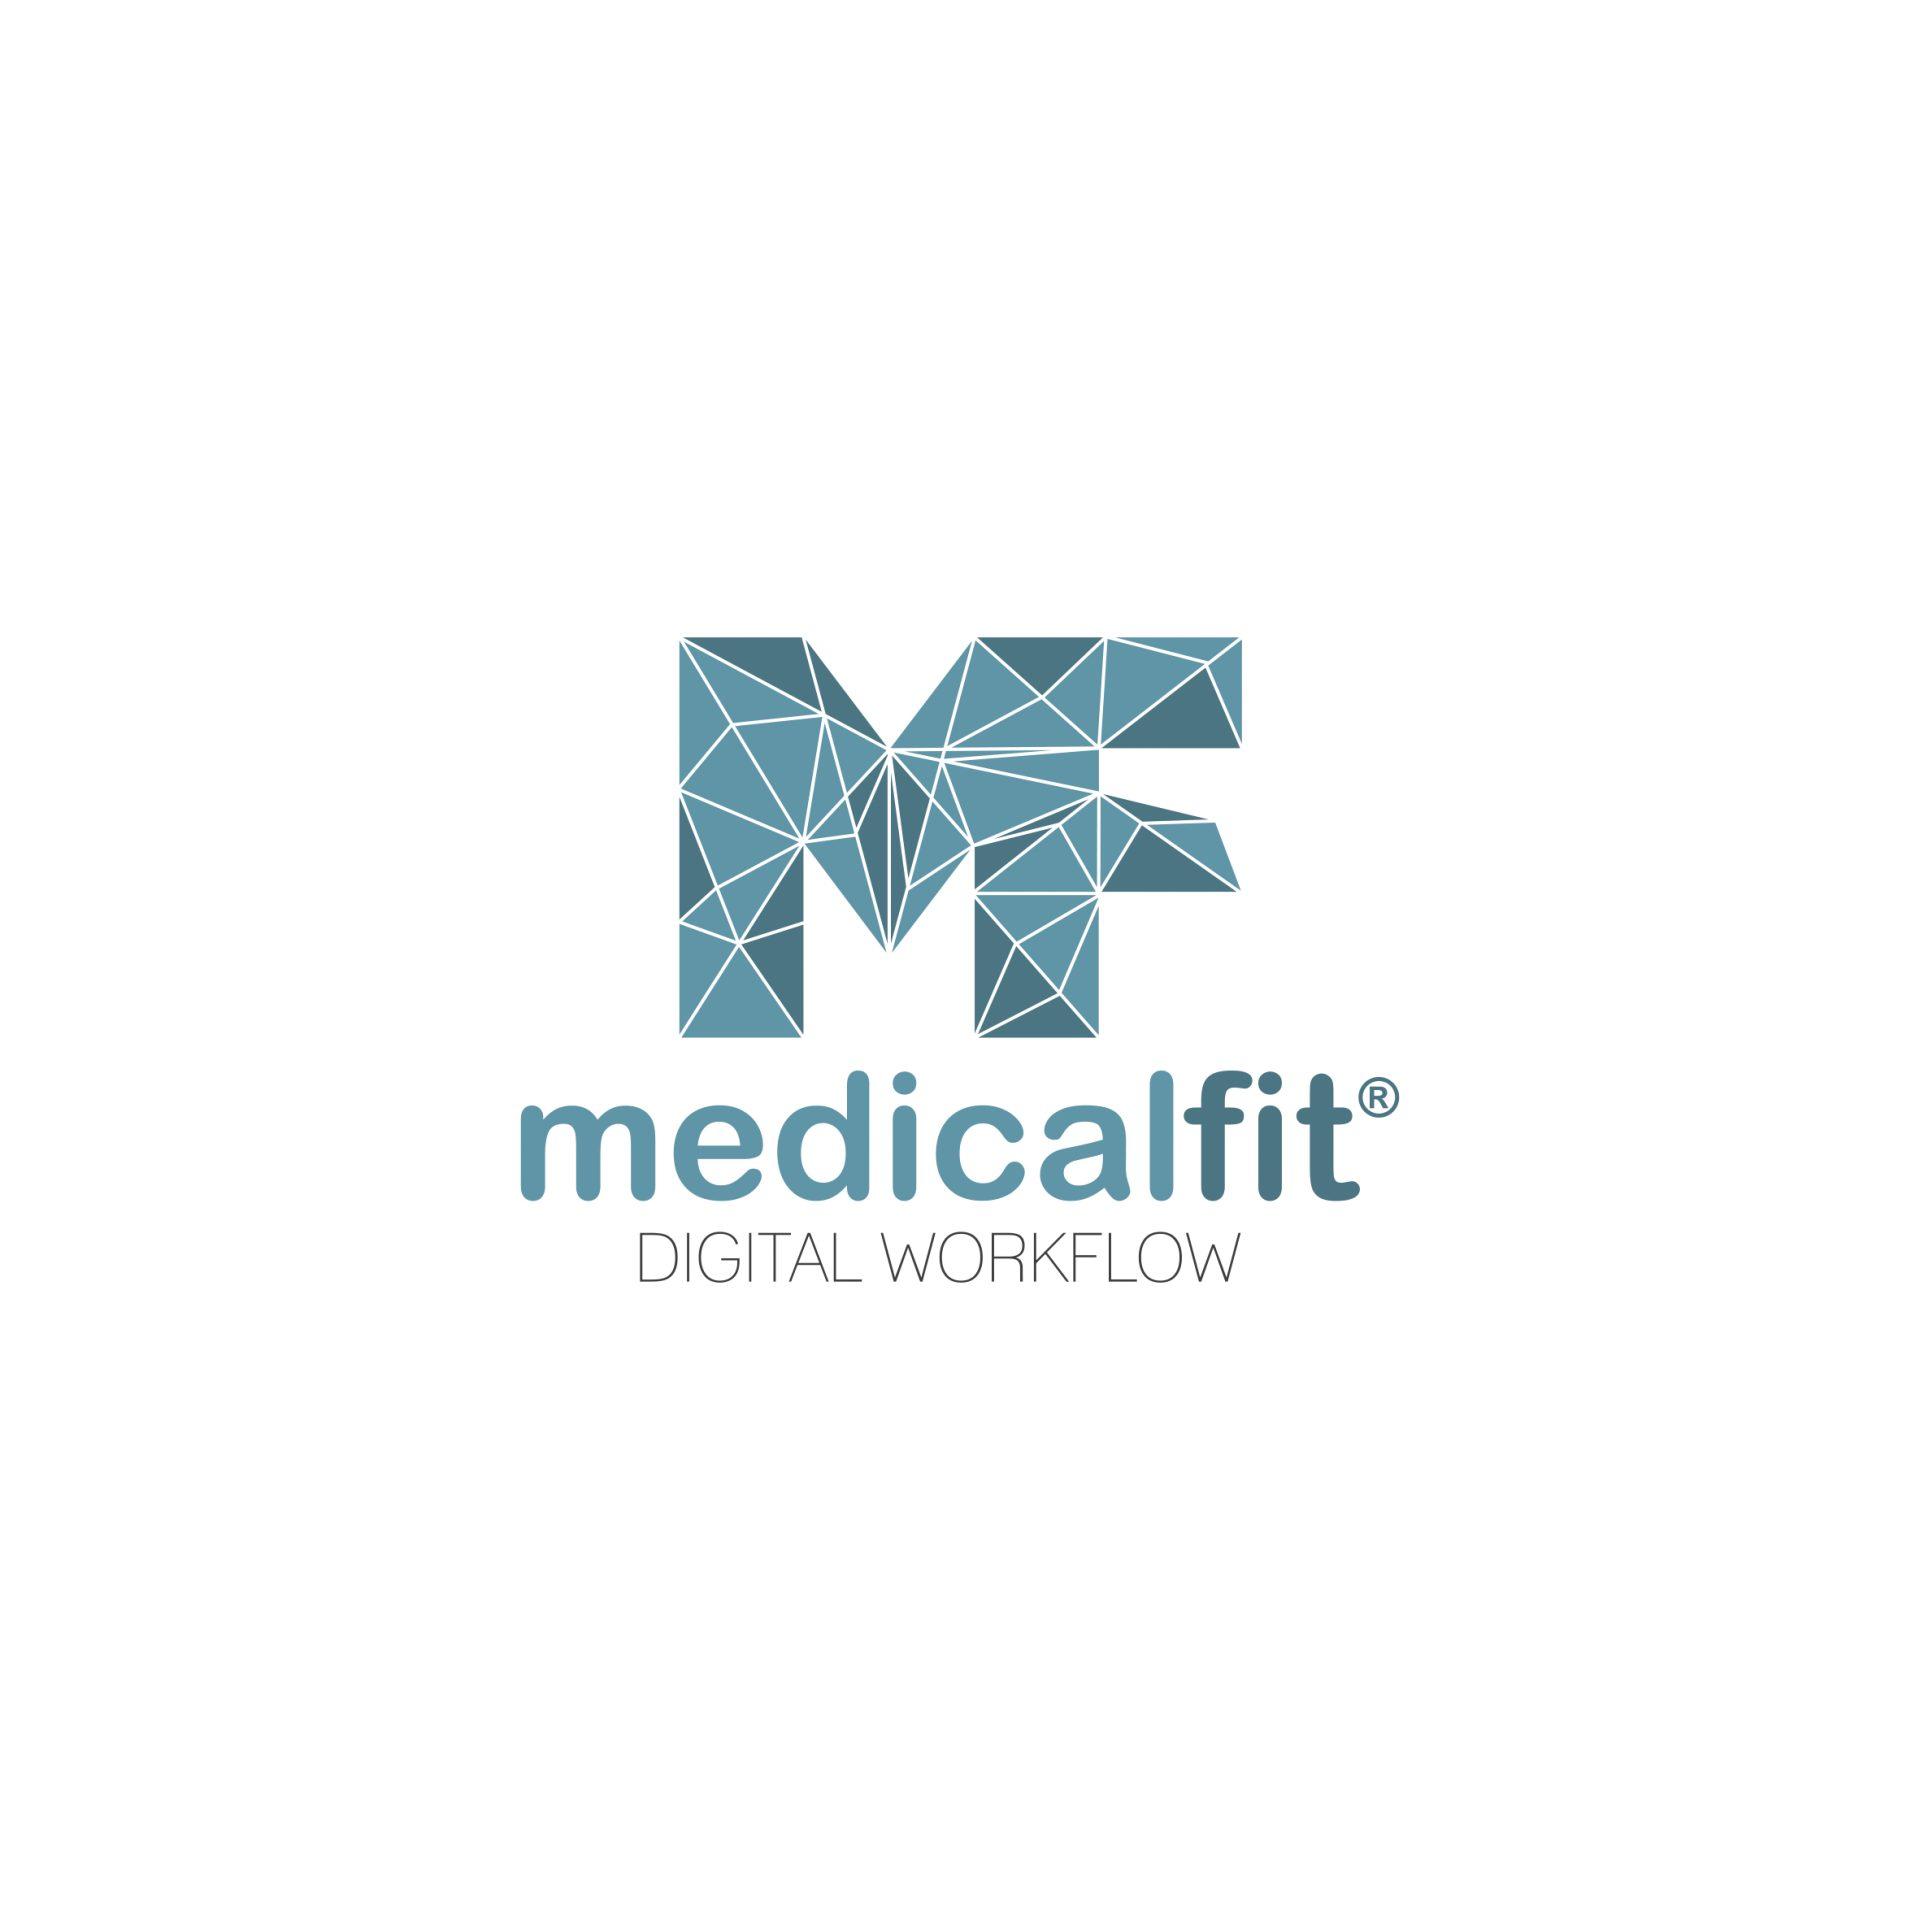 Medicalfit Logo - Crooke laguna